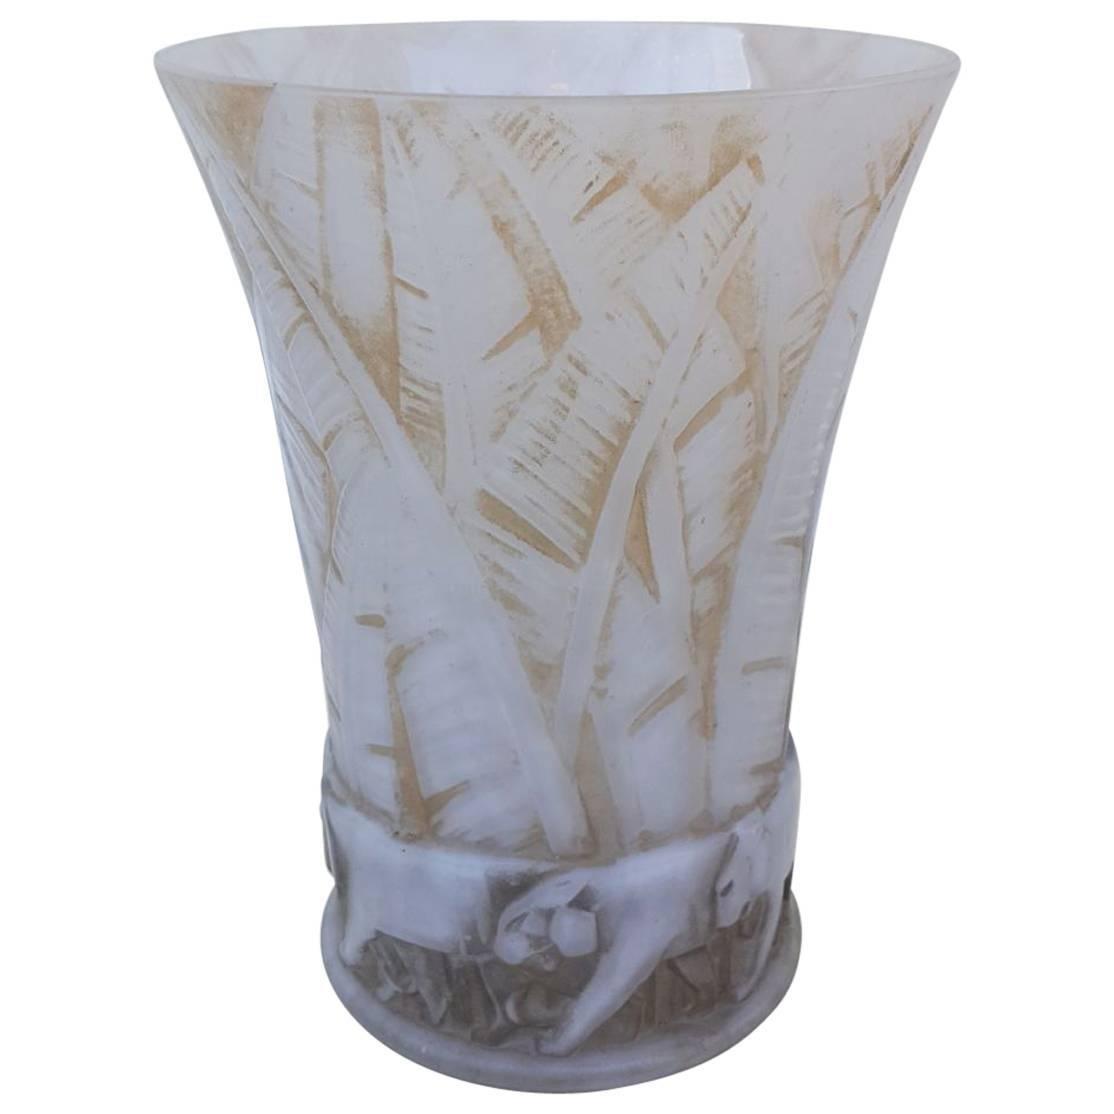 D'Avesn Art Deco Glass Lion Vase